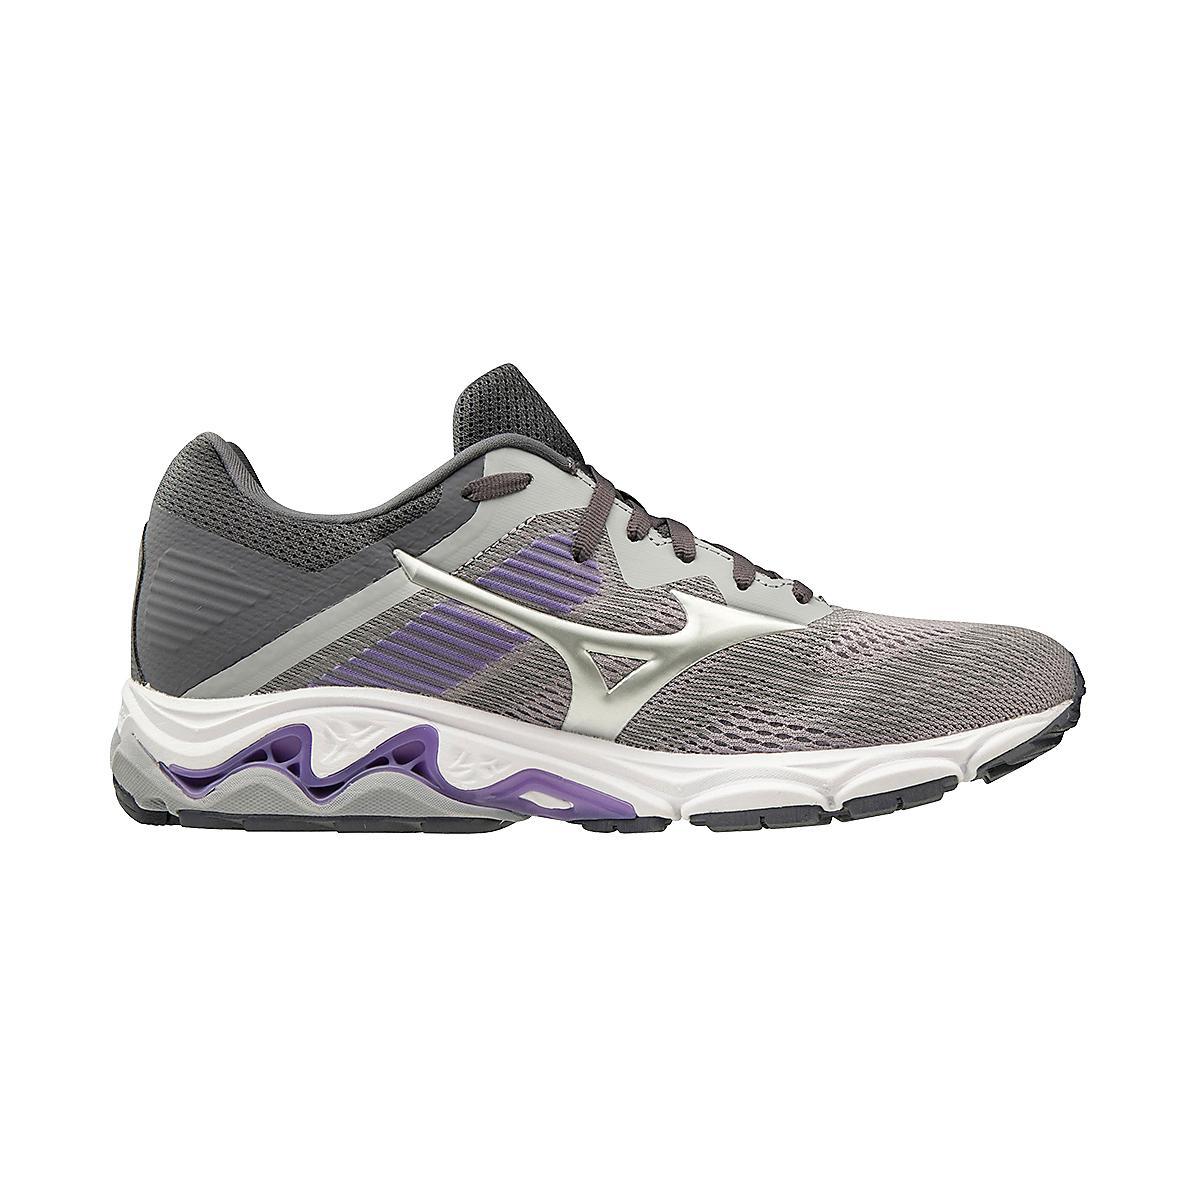 best mizuno shoes for walking en espa�ol cap